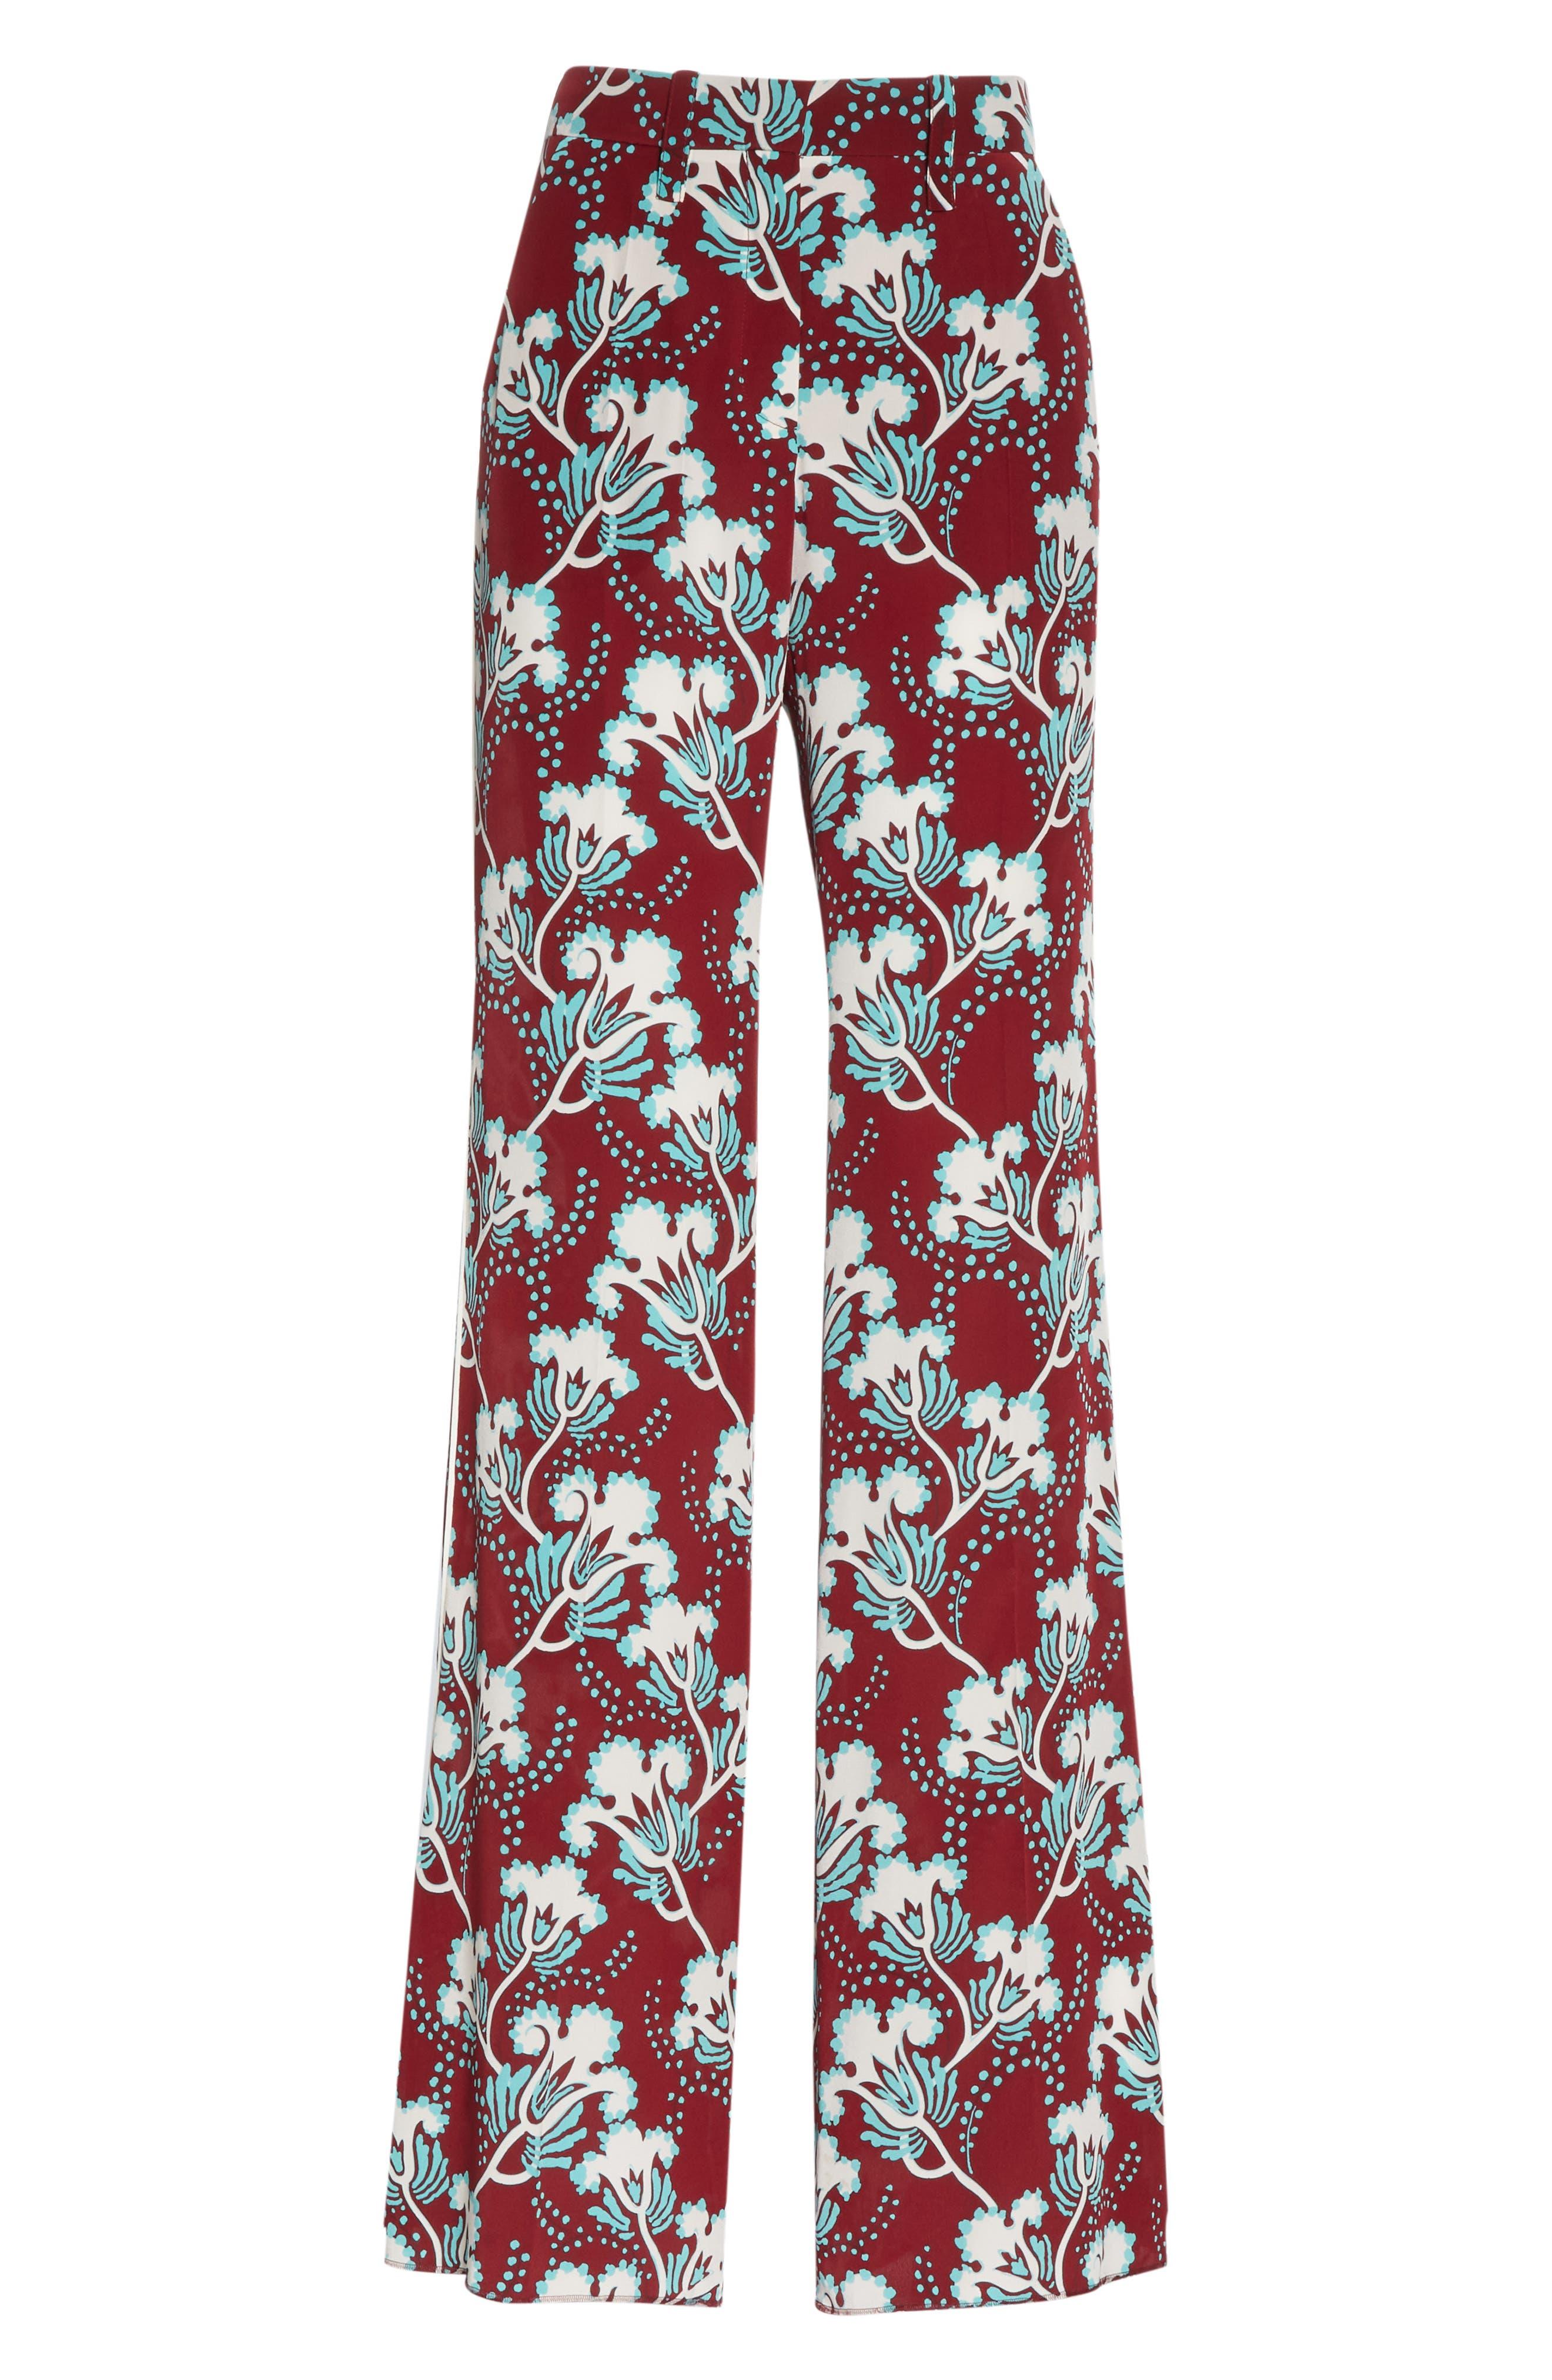 VALENTINO, Elderflower Print Wide Leg Silk Pants, Alternate thumbnail 6, color, GTB-GARNET/TURCHESE/BIANCO